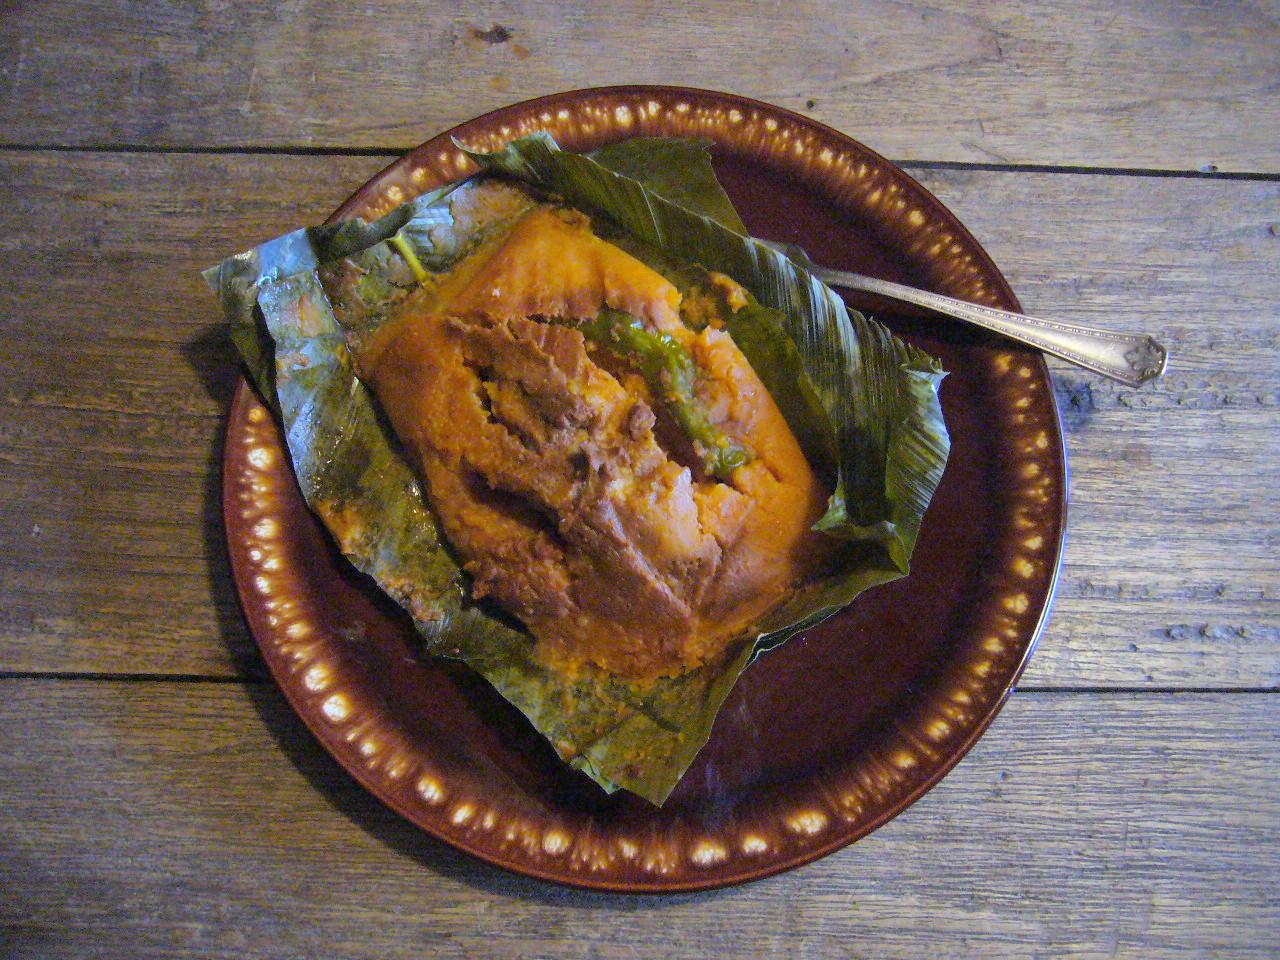 Comida de chocho - 2 part 1